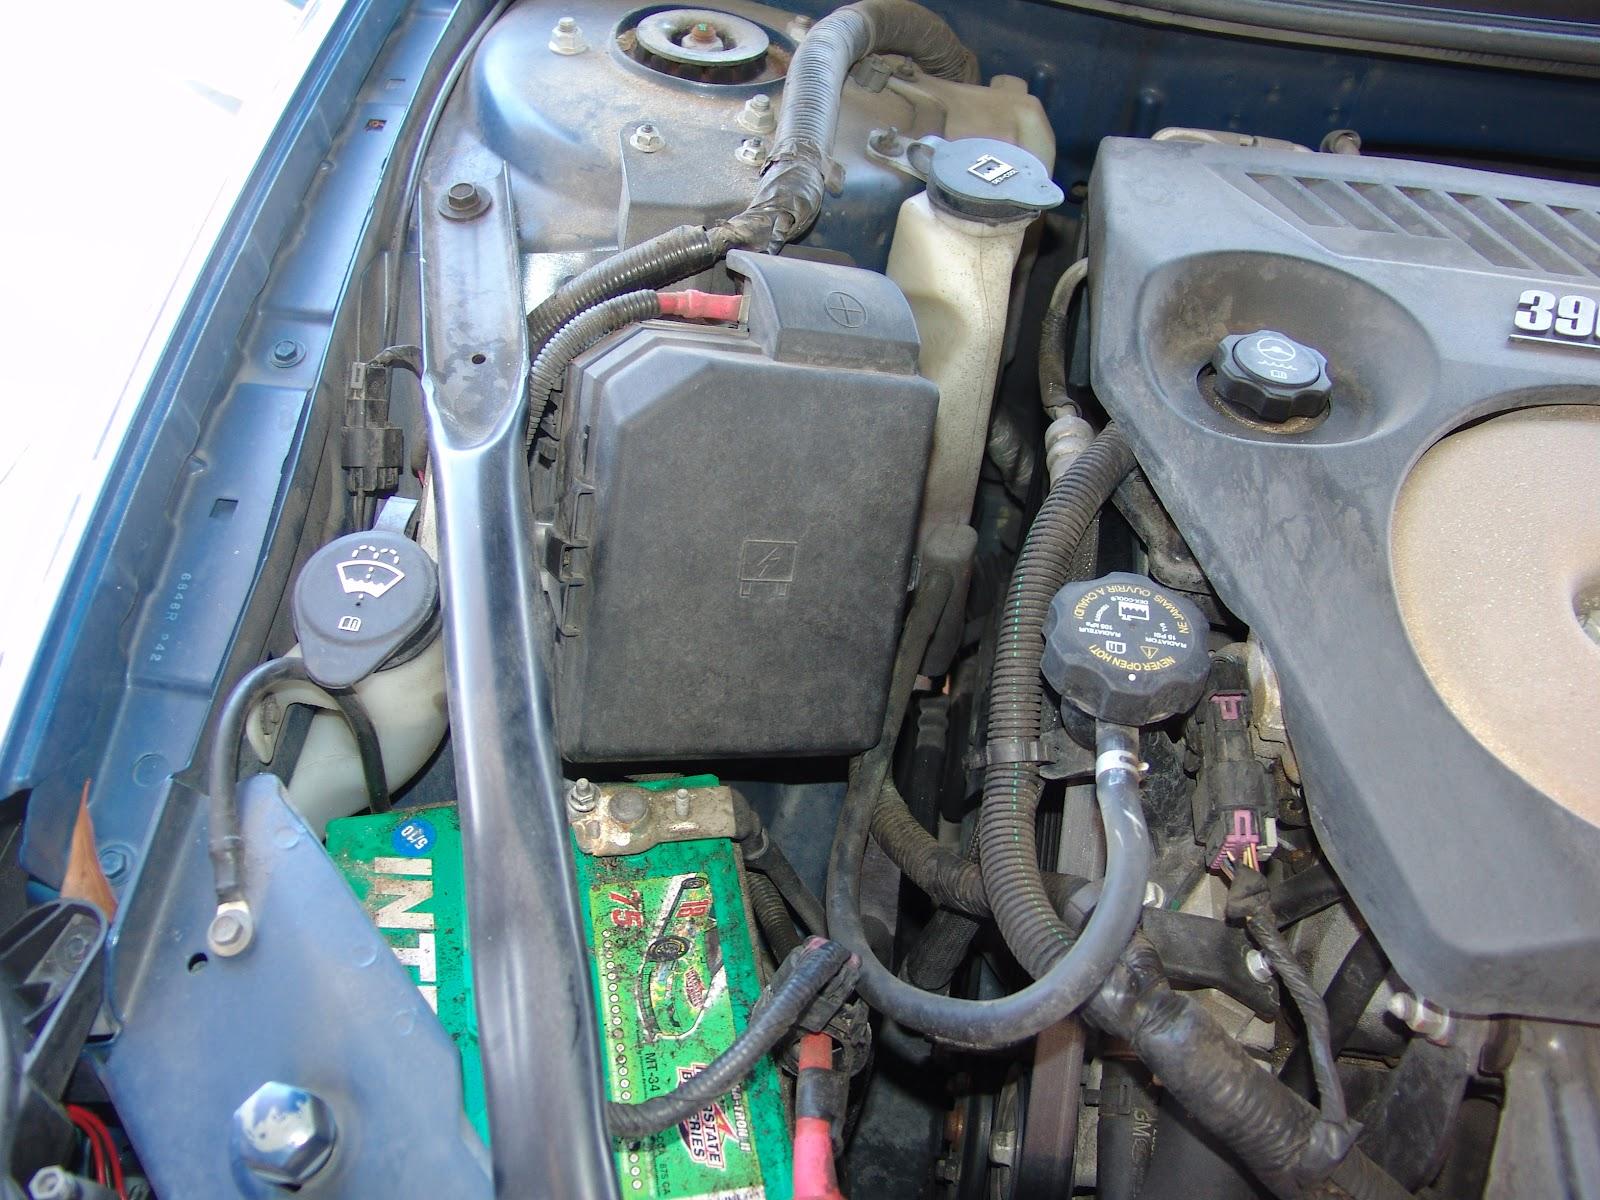 inside a 2002 chevy impala fuse box inside automotive wiring description 06904 inside a chevy impala fuse box